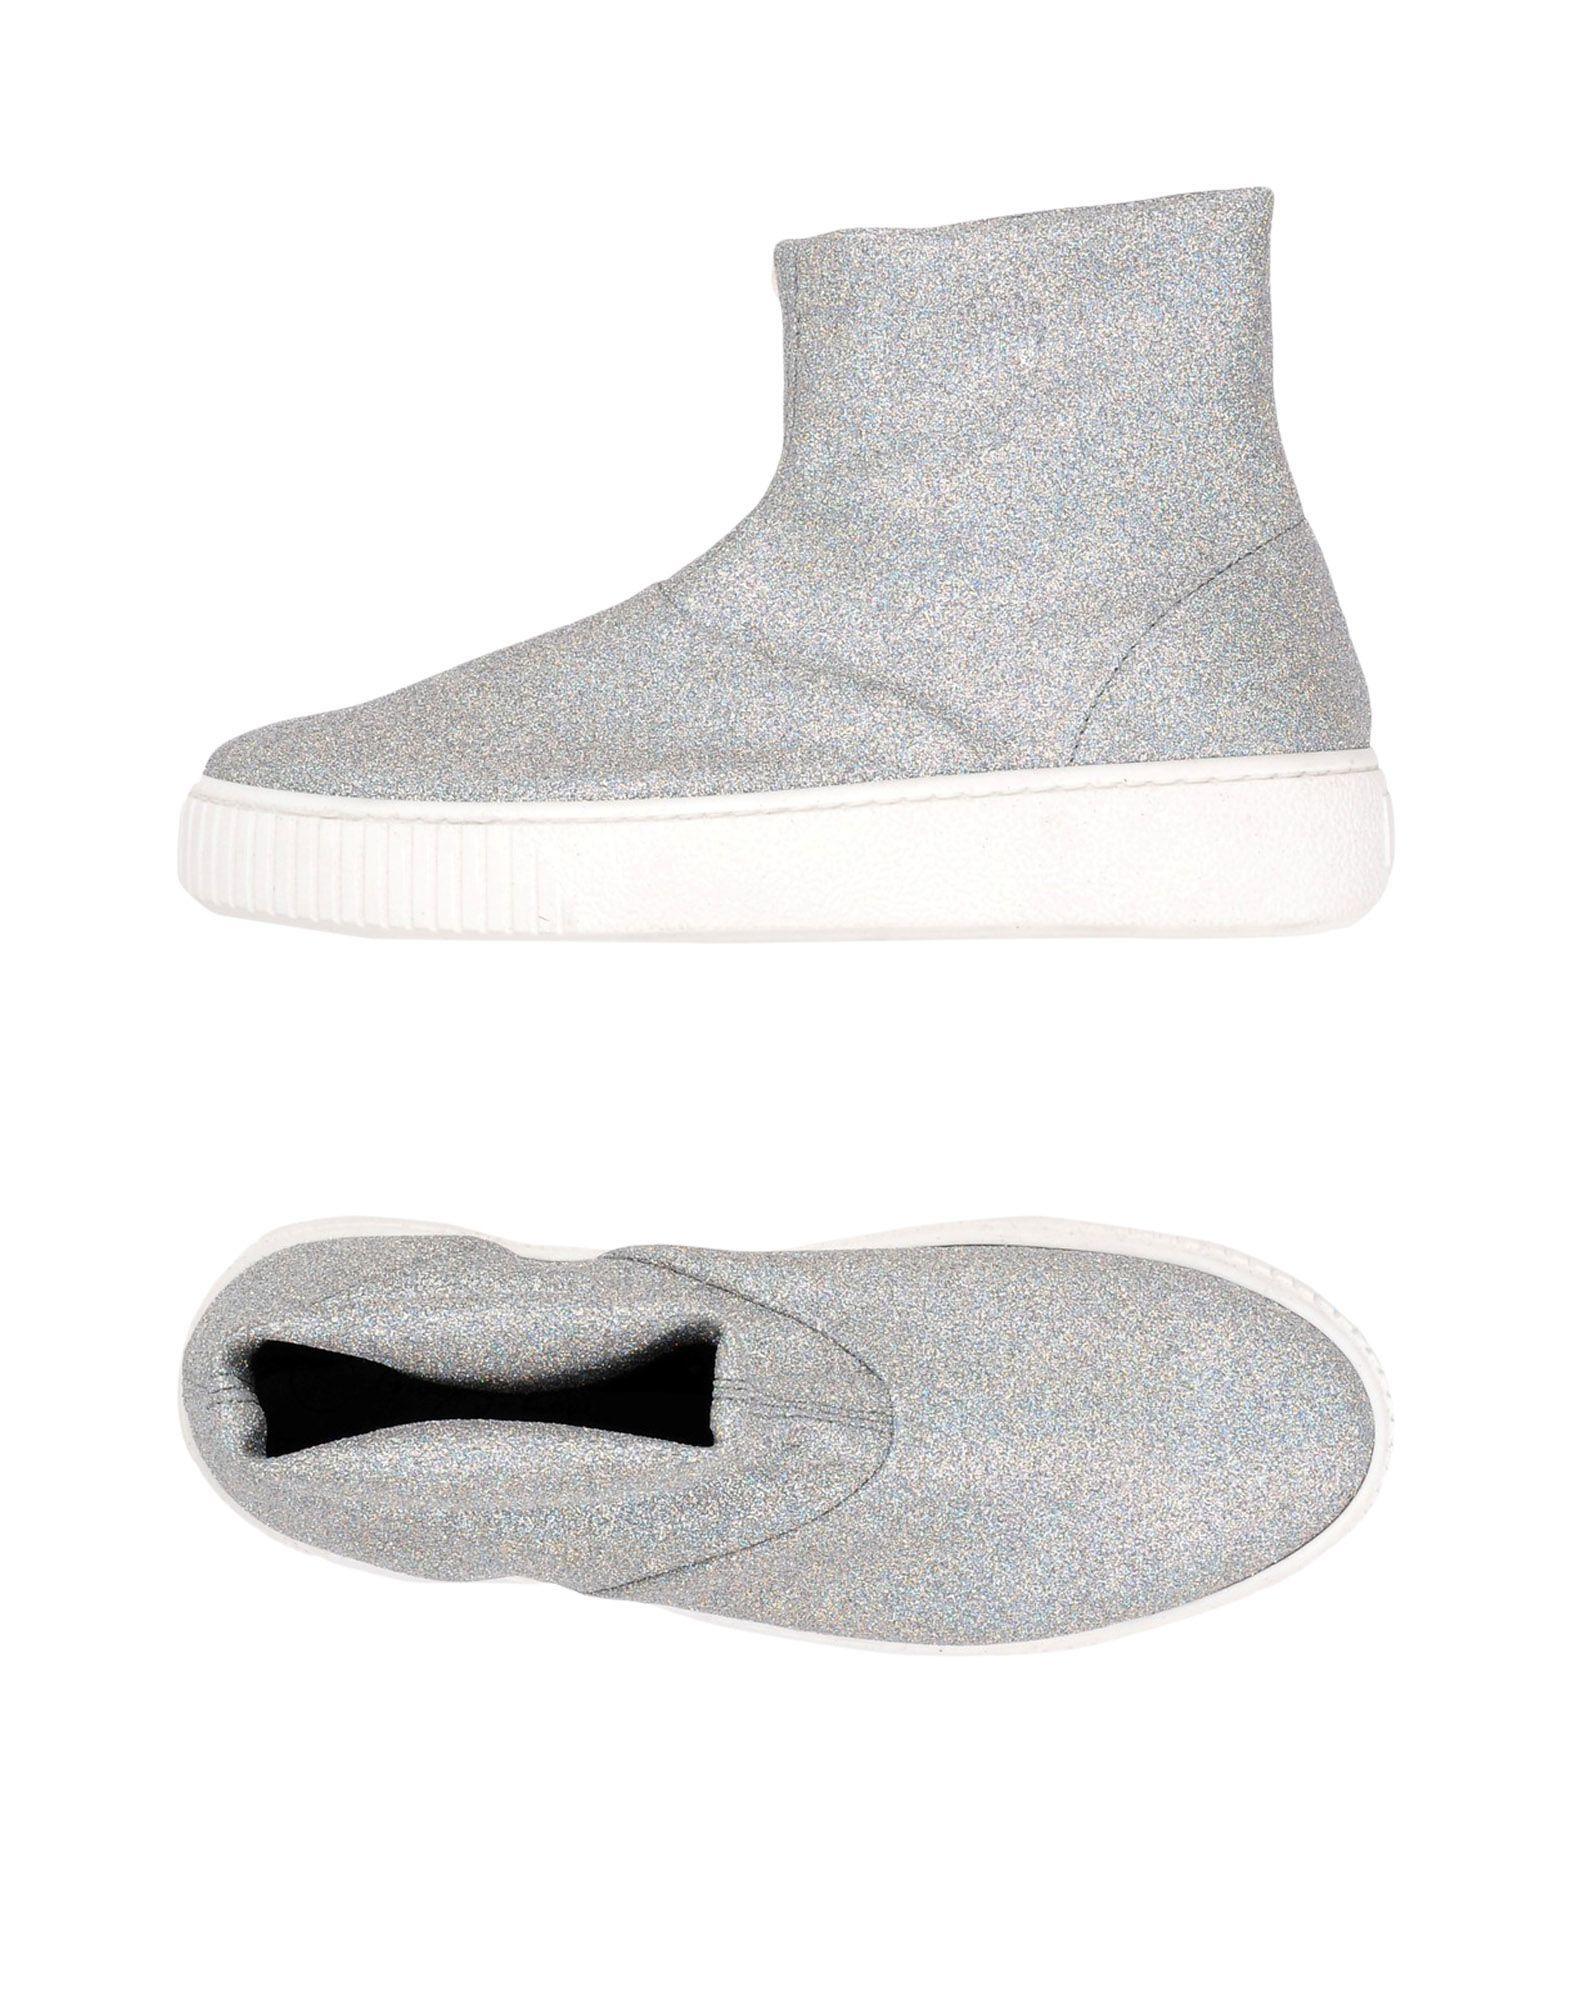 Sneakers George J. Love Donna - 11446144FI